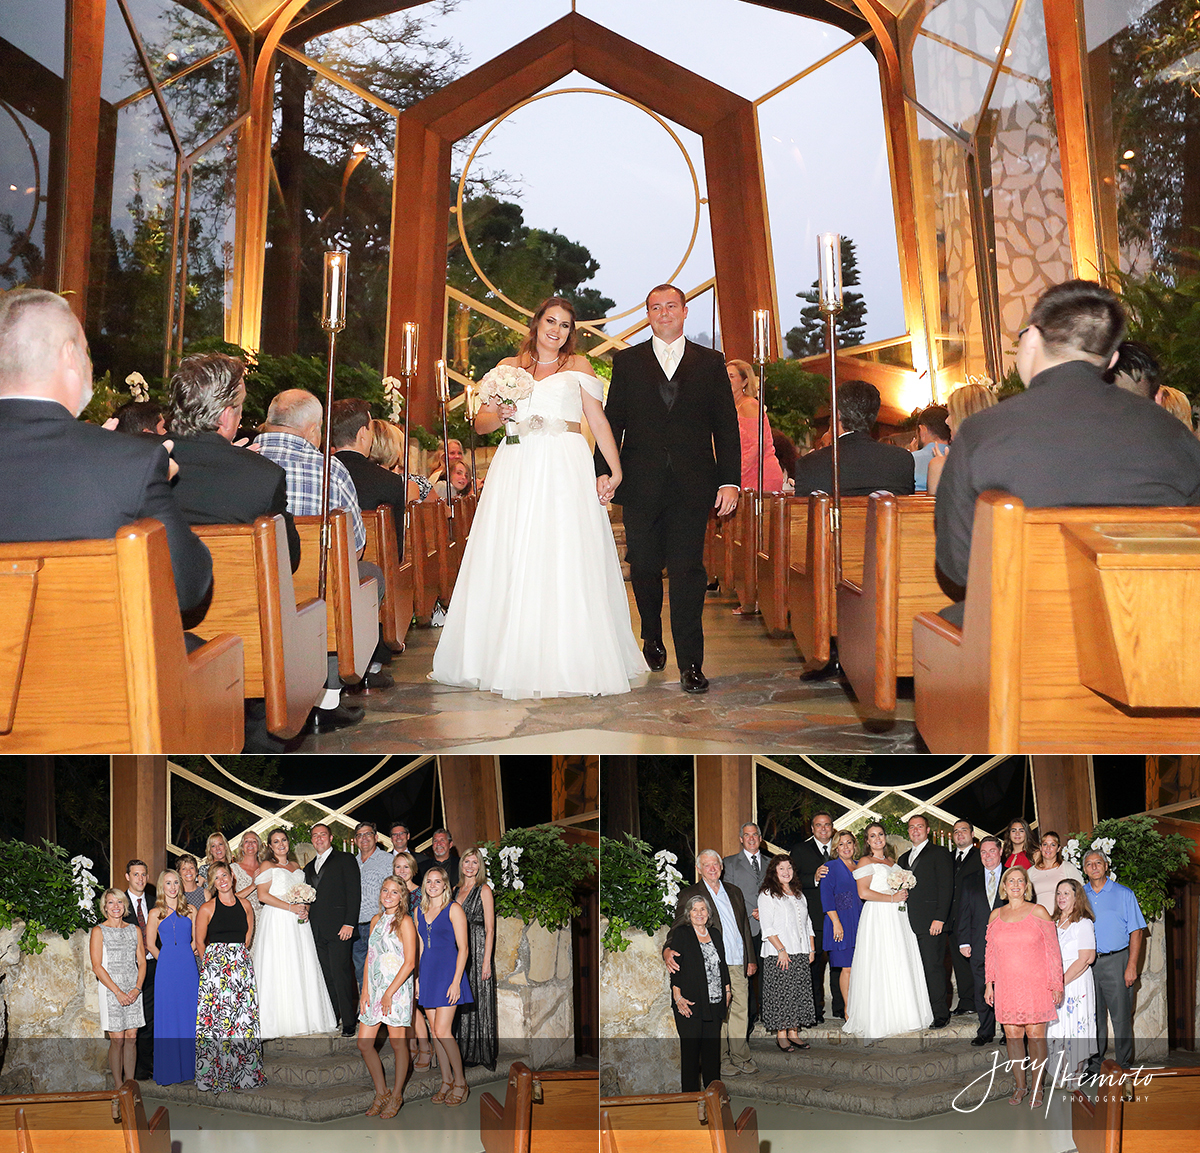 Wayfarers-Chapel-Palos-Verdes-Wedding_0032_Blog-Collage-1471999192601